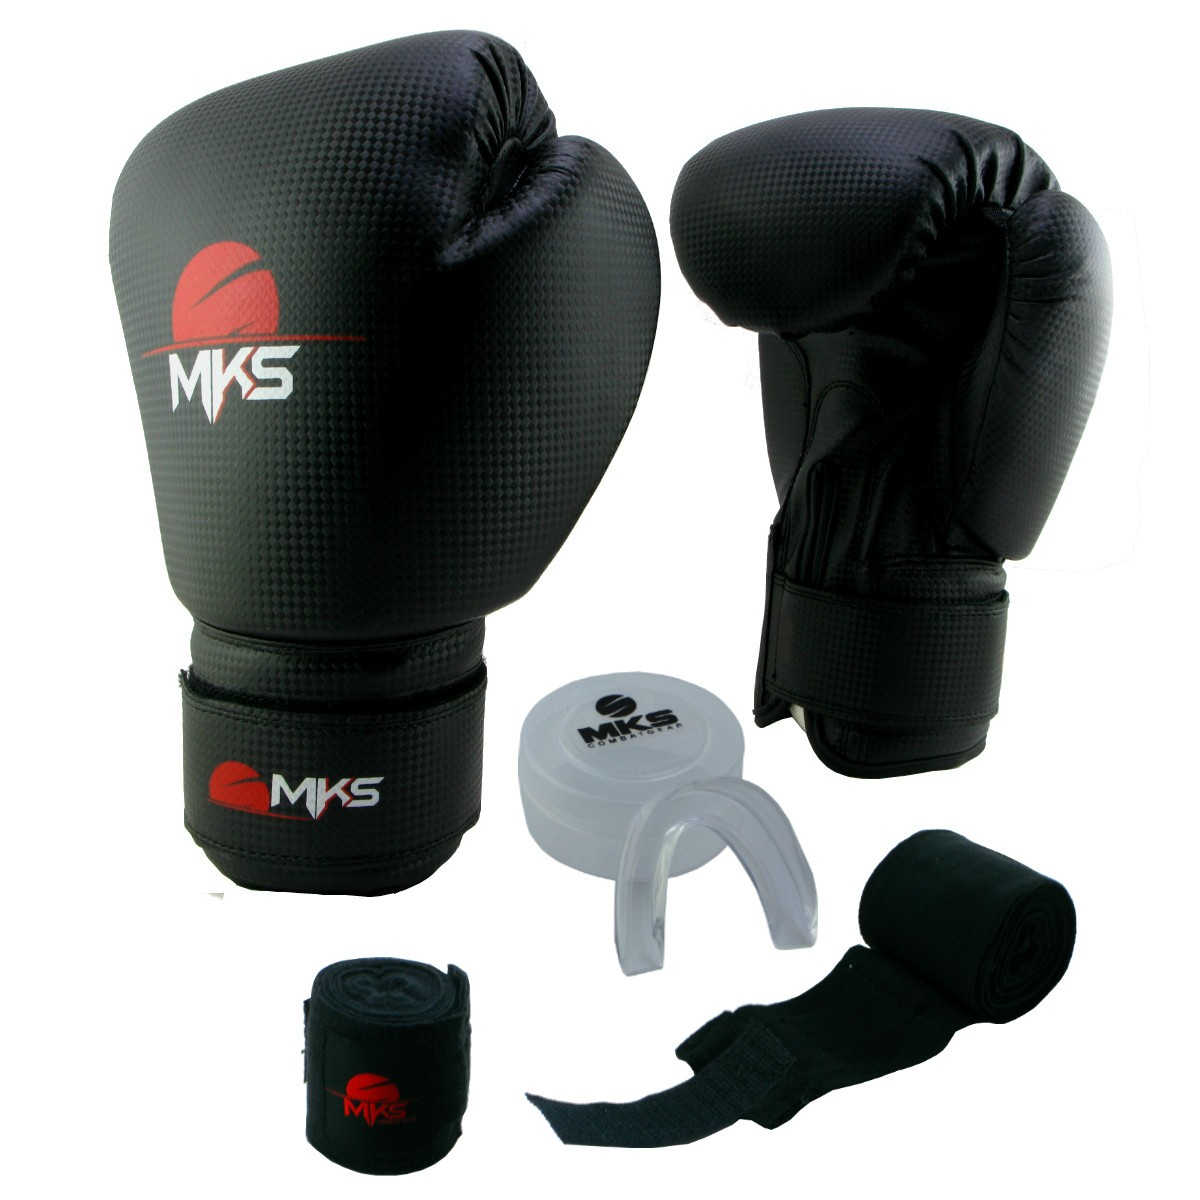 Luva de Boxe Prospect MKS Preta 12 oz + Protetor Bucal + Bandagem